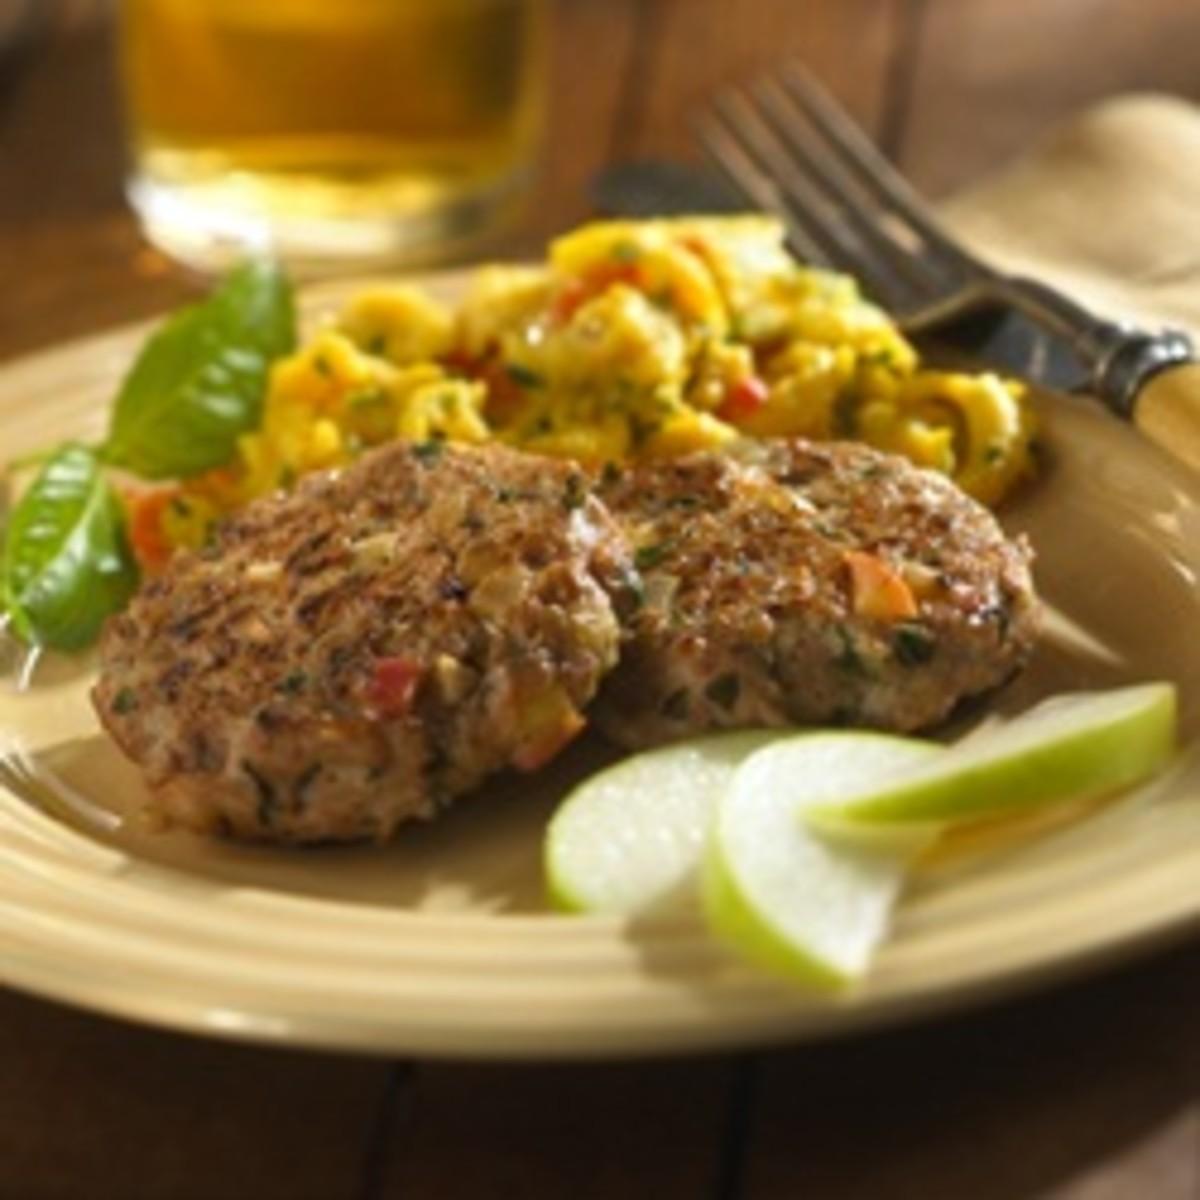 Chicken, Apple and Basil Sausage Patties